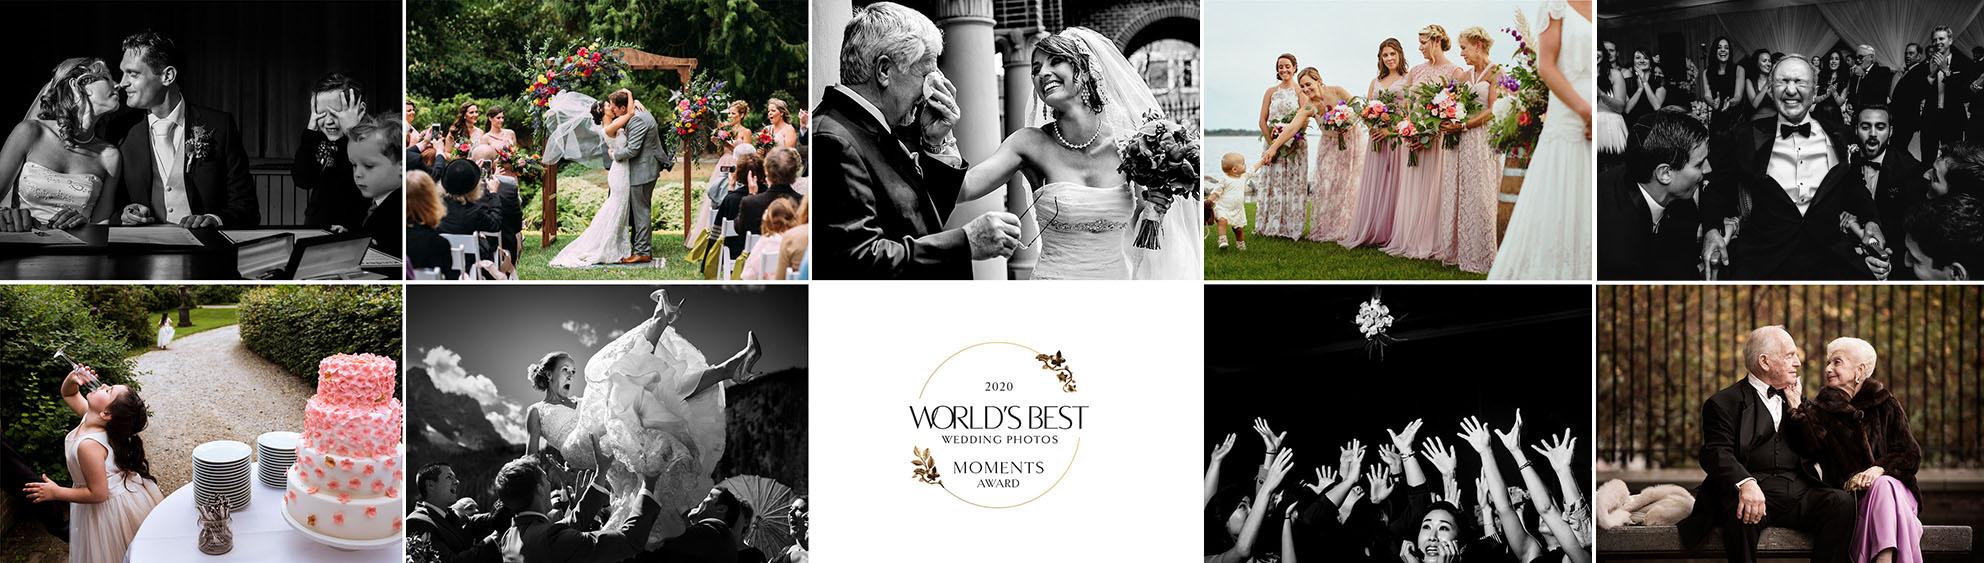 World's Best Wedding Photos Decisive Moment Contest